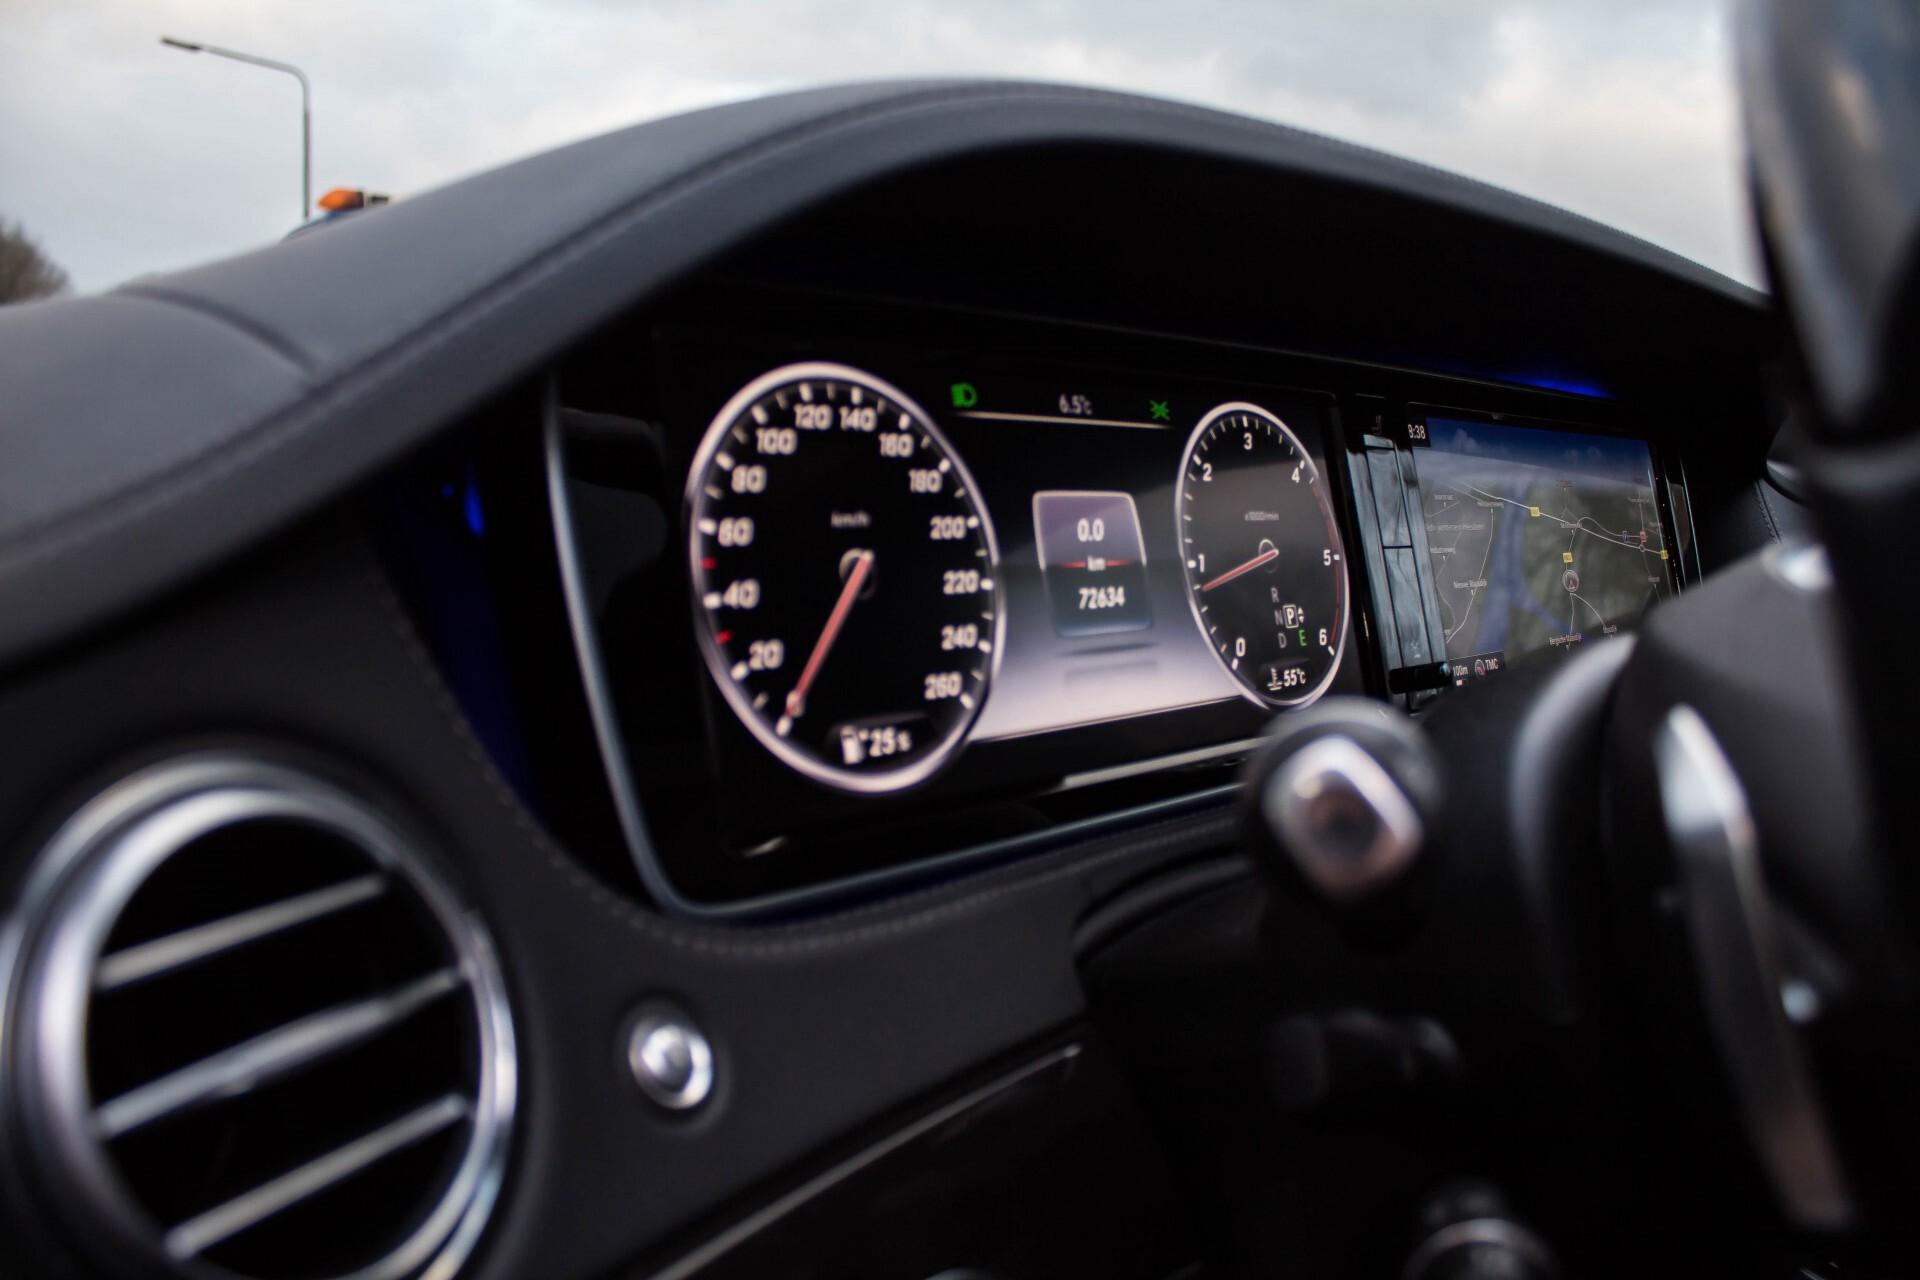 Mercedes-Benz S-Klasse 350 BlueTEC 63 AMG Panorama/Distronic/Keyless/Massage/Burmester Aut7 Foto 25